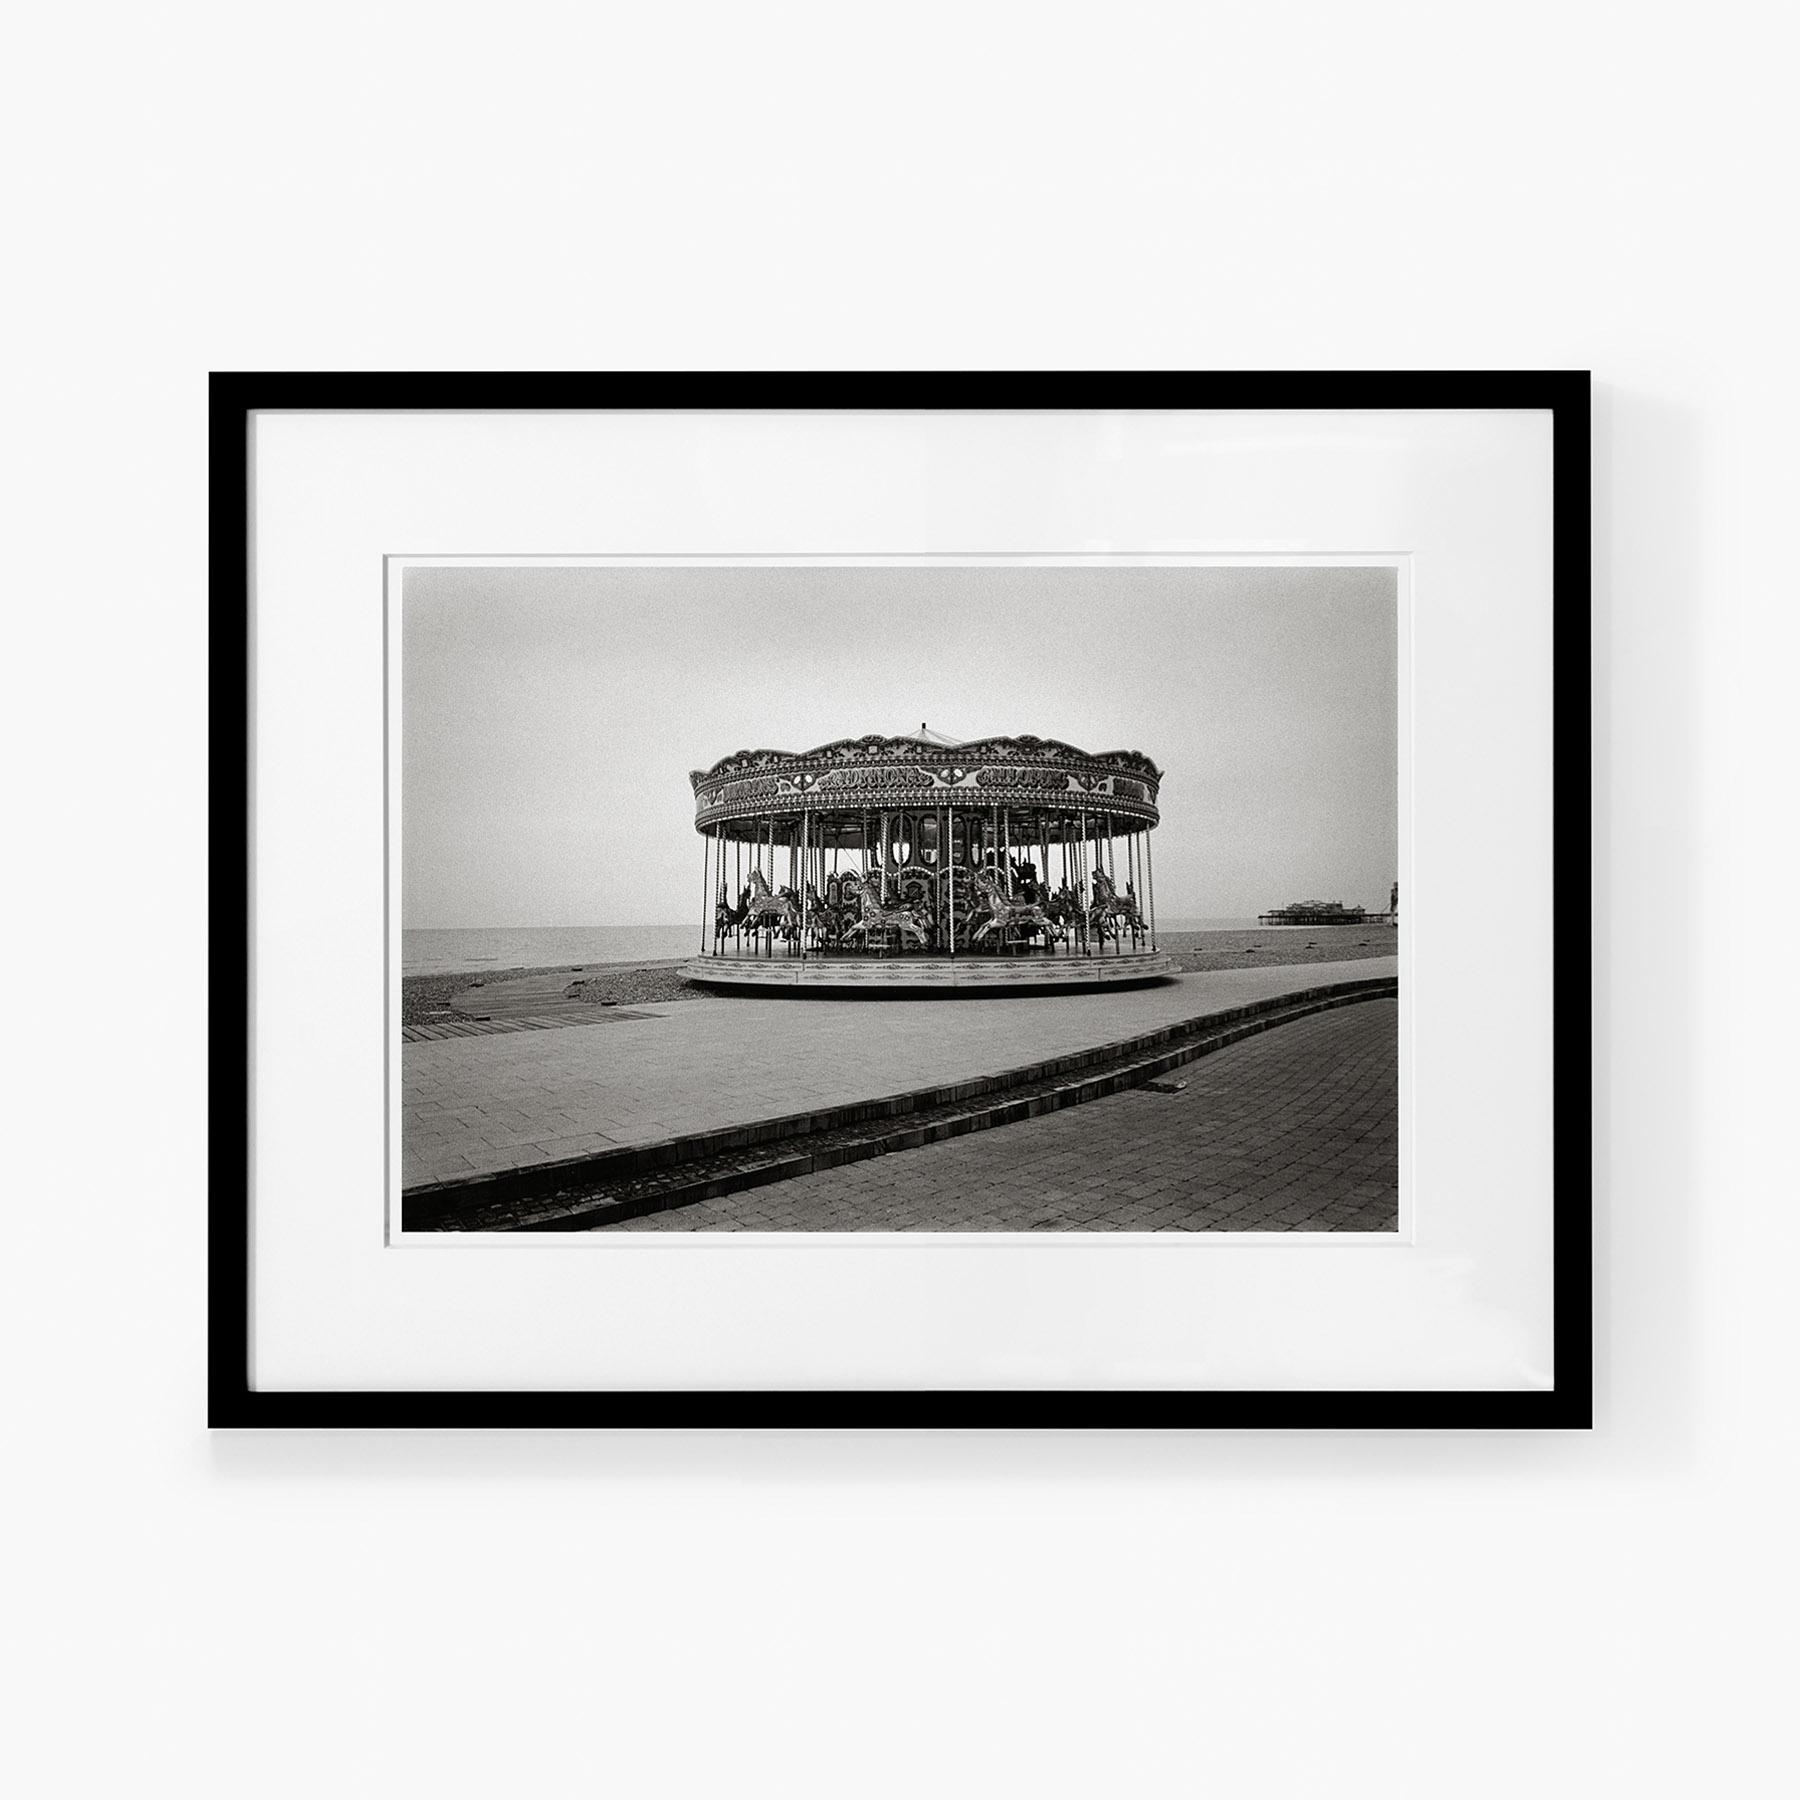 Tirage_Andre_Carrara_Le manège, 1996, Brighton